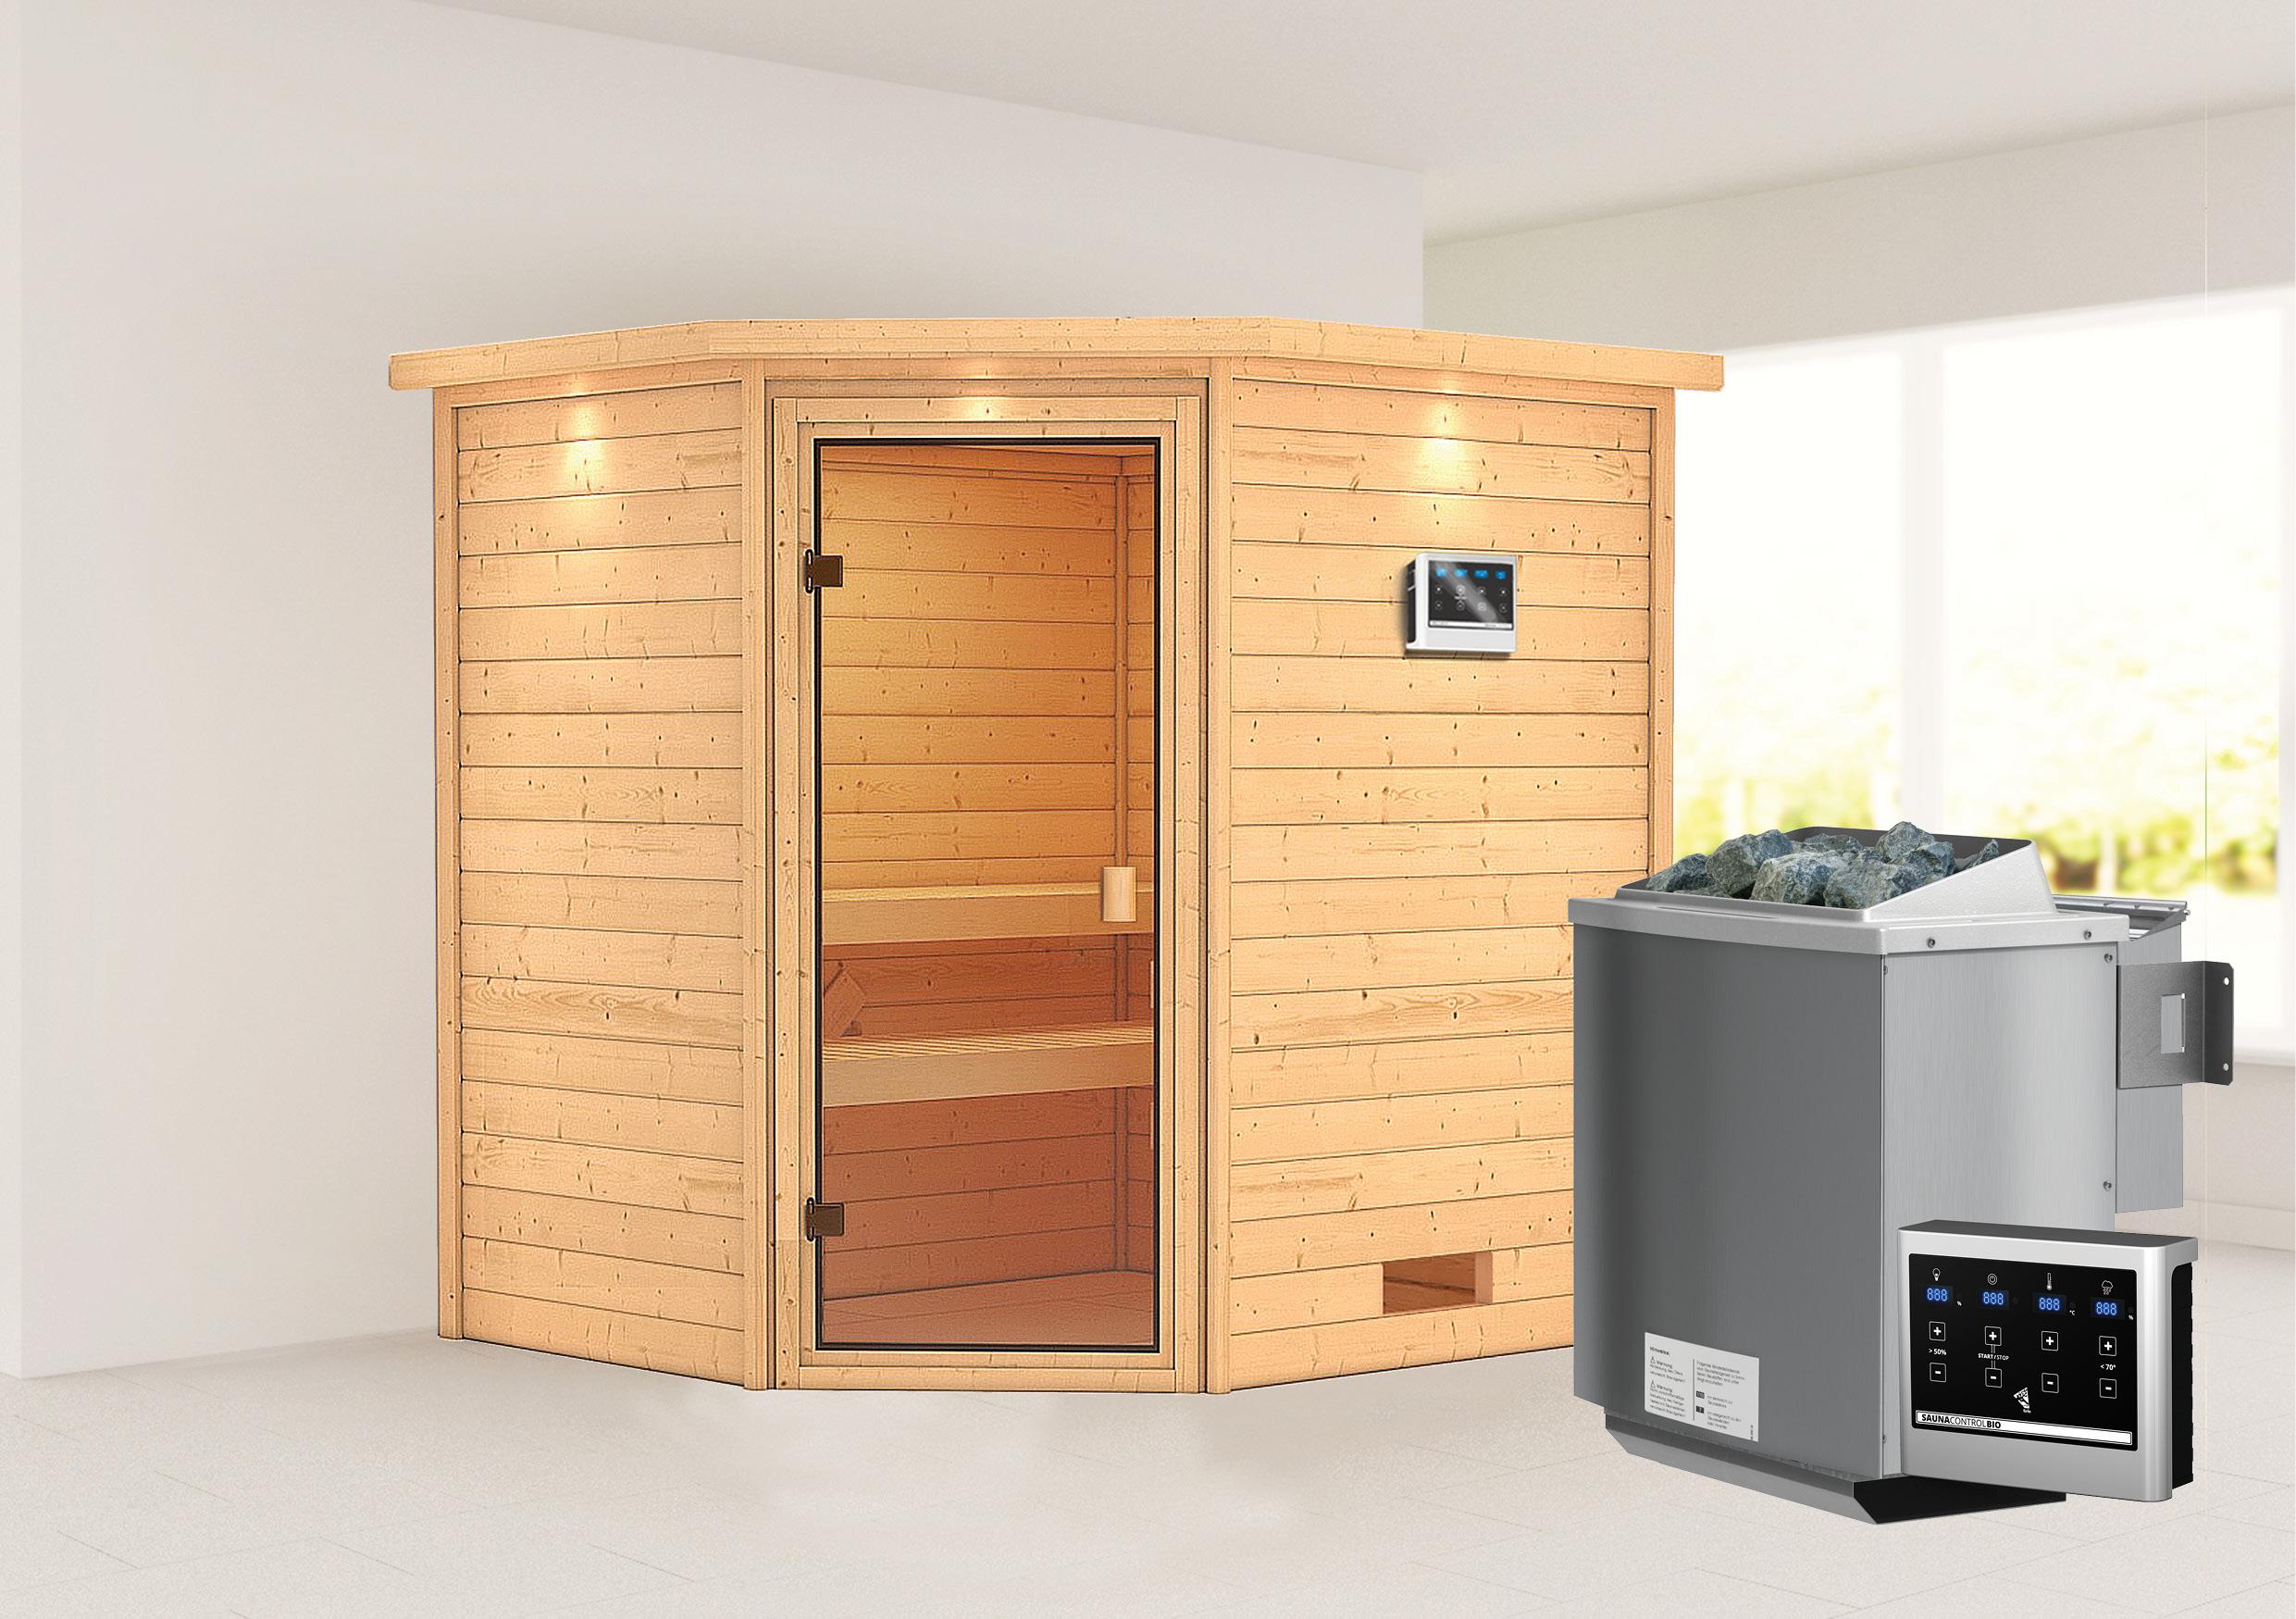 Woodfeeling Sauna Elea 38mm Dachkranz Bio Saunaofen 9kW extern Bild 1